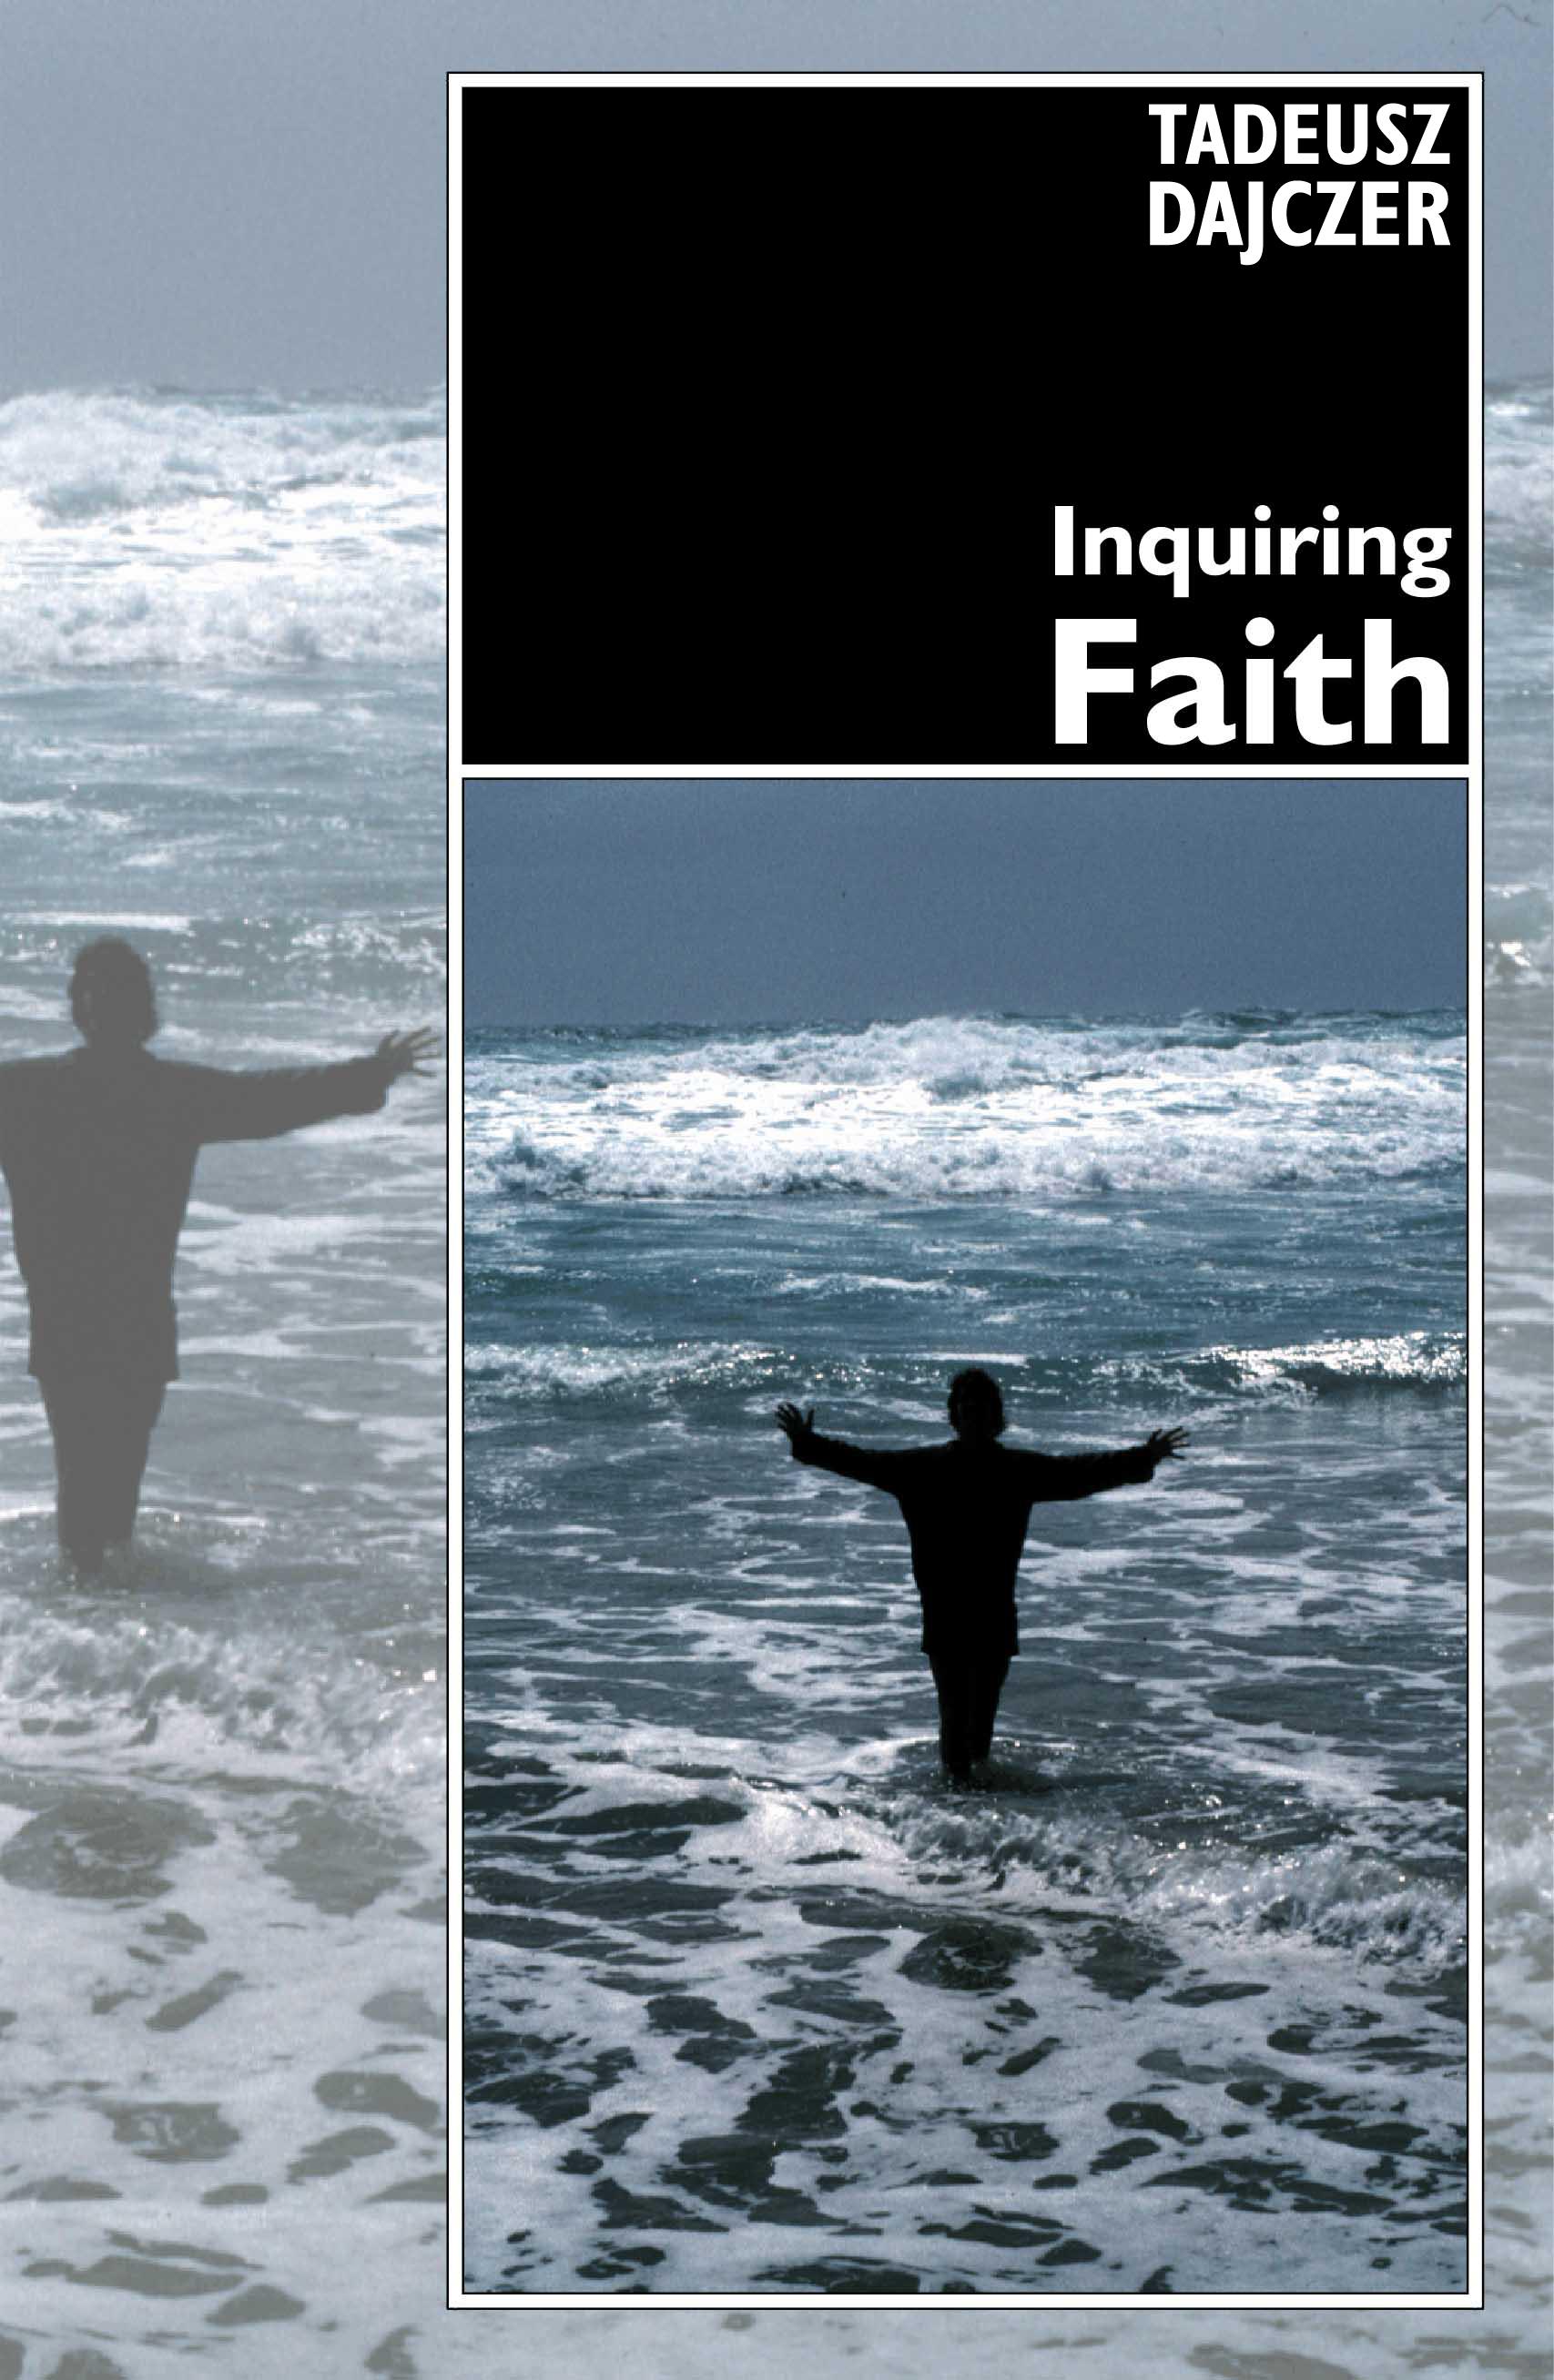 Inquiring Faith | Tadeusz Dajczer